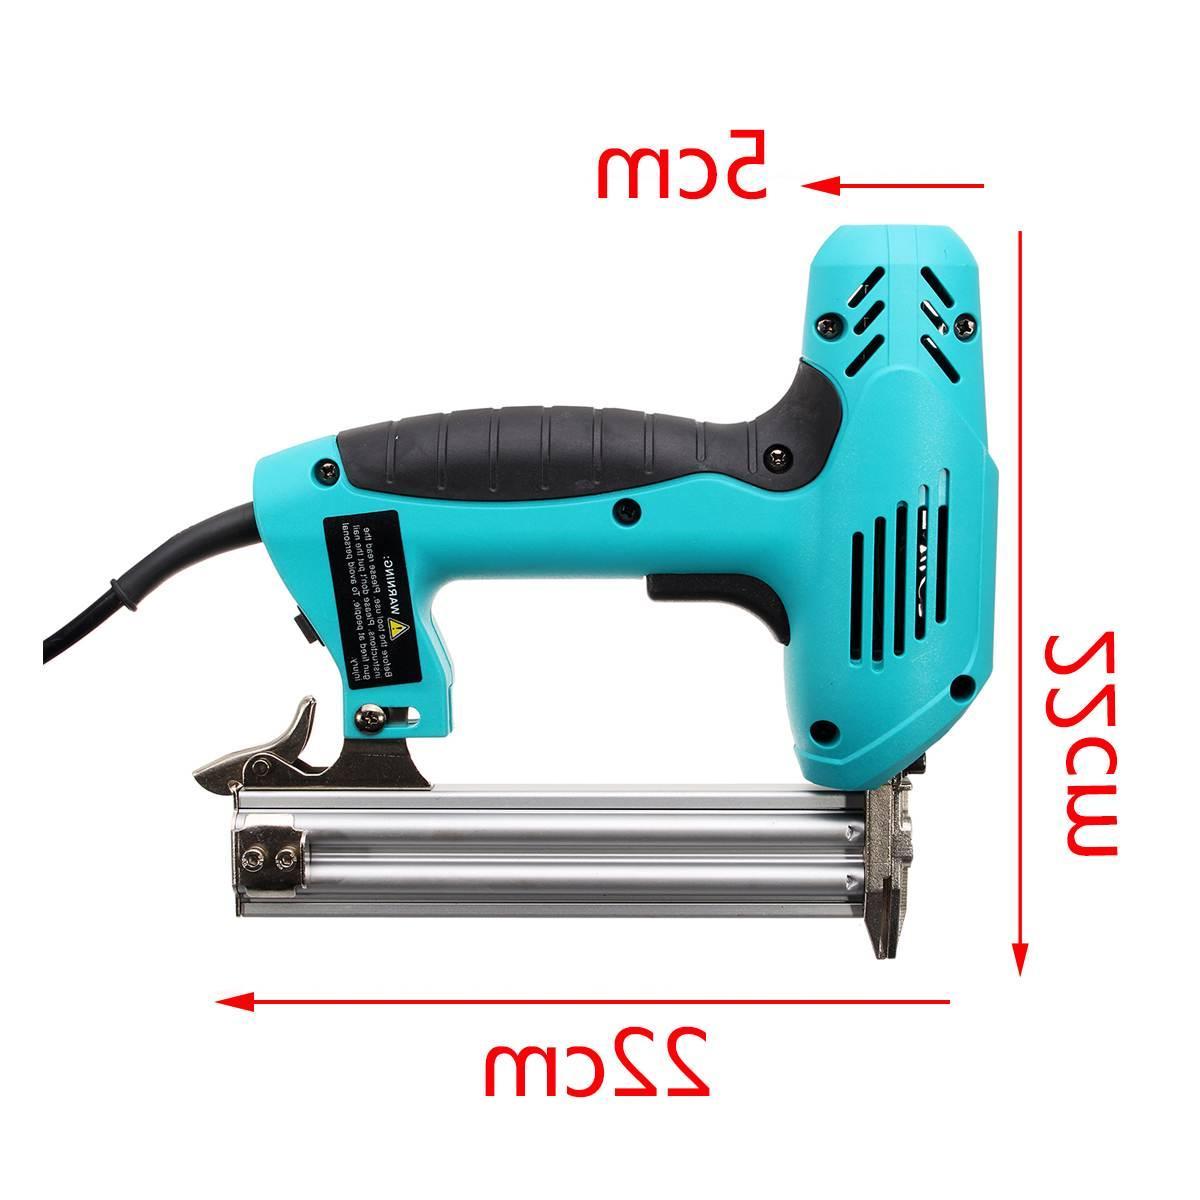 10-30mm Electric Heavy-Duty Woodworking Tool Staple <font><b>Nail</b></font> 220V Portable <font><b>Gun</b></font>